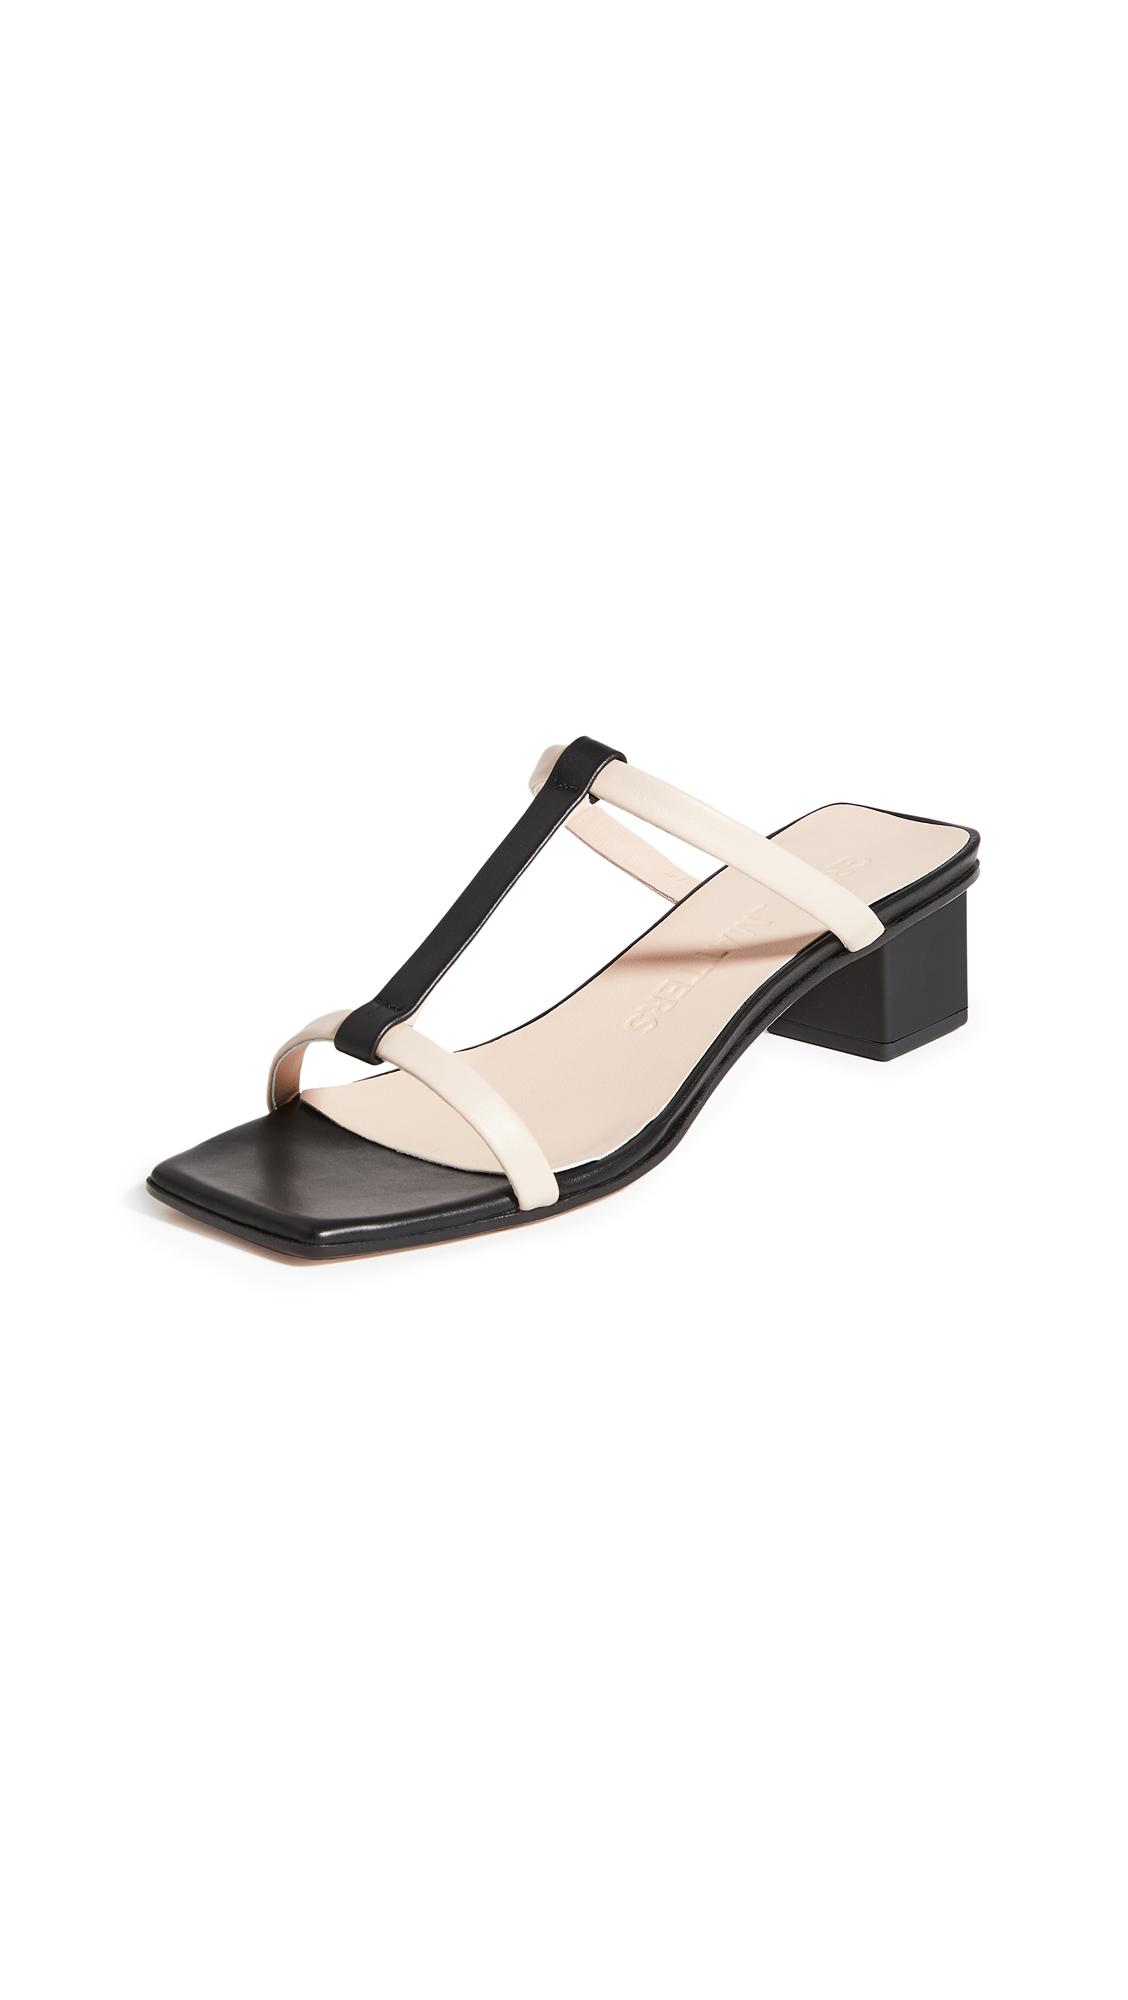 Buy Gray Matters Giulia Sandals online, shop Gray Matters